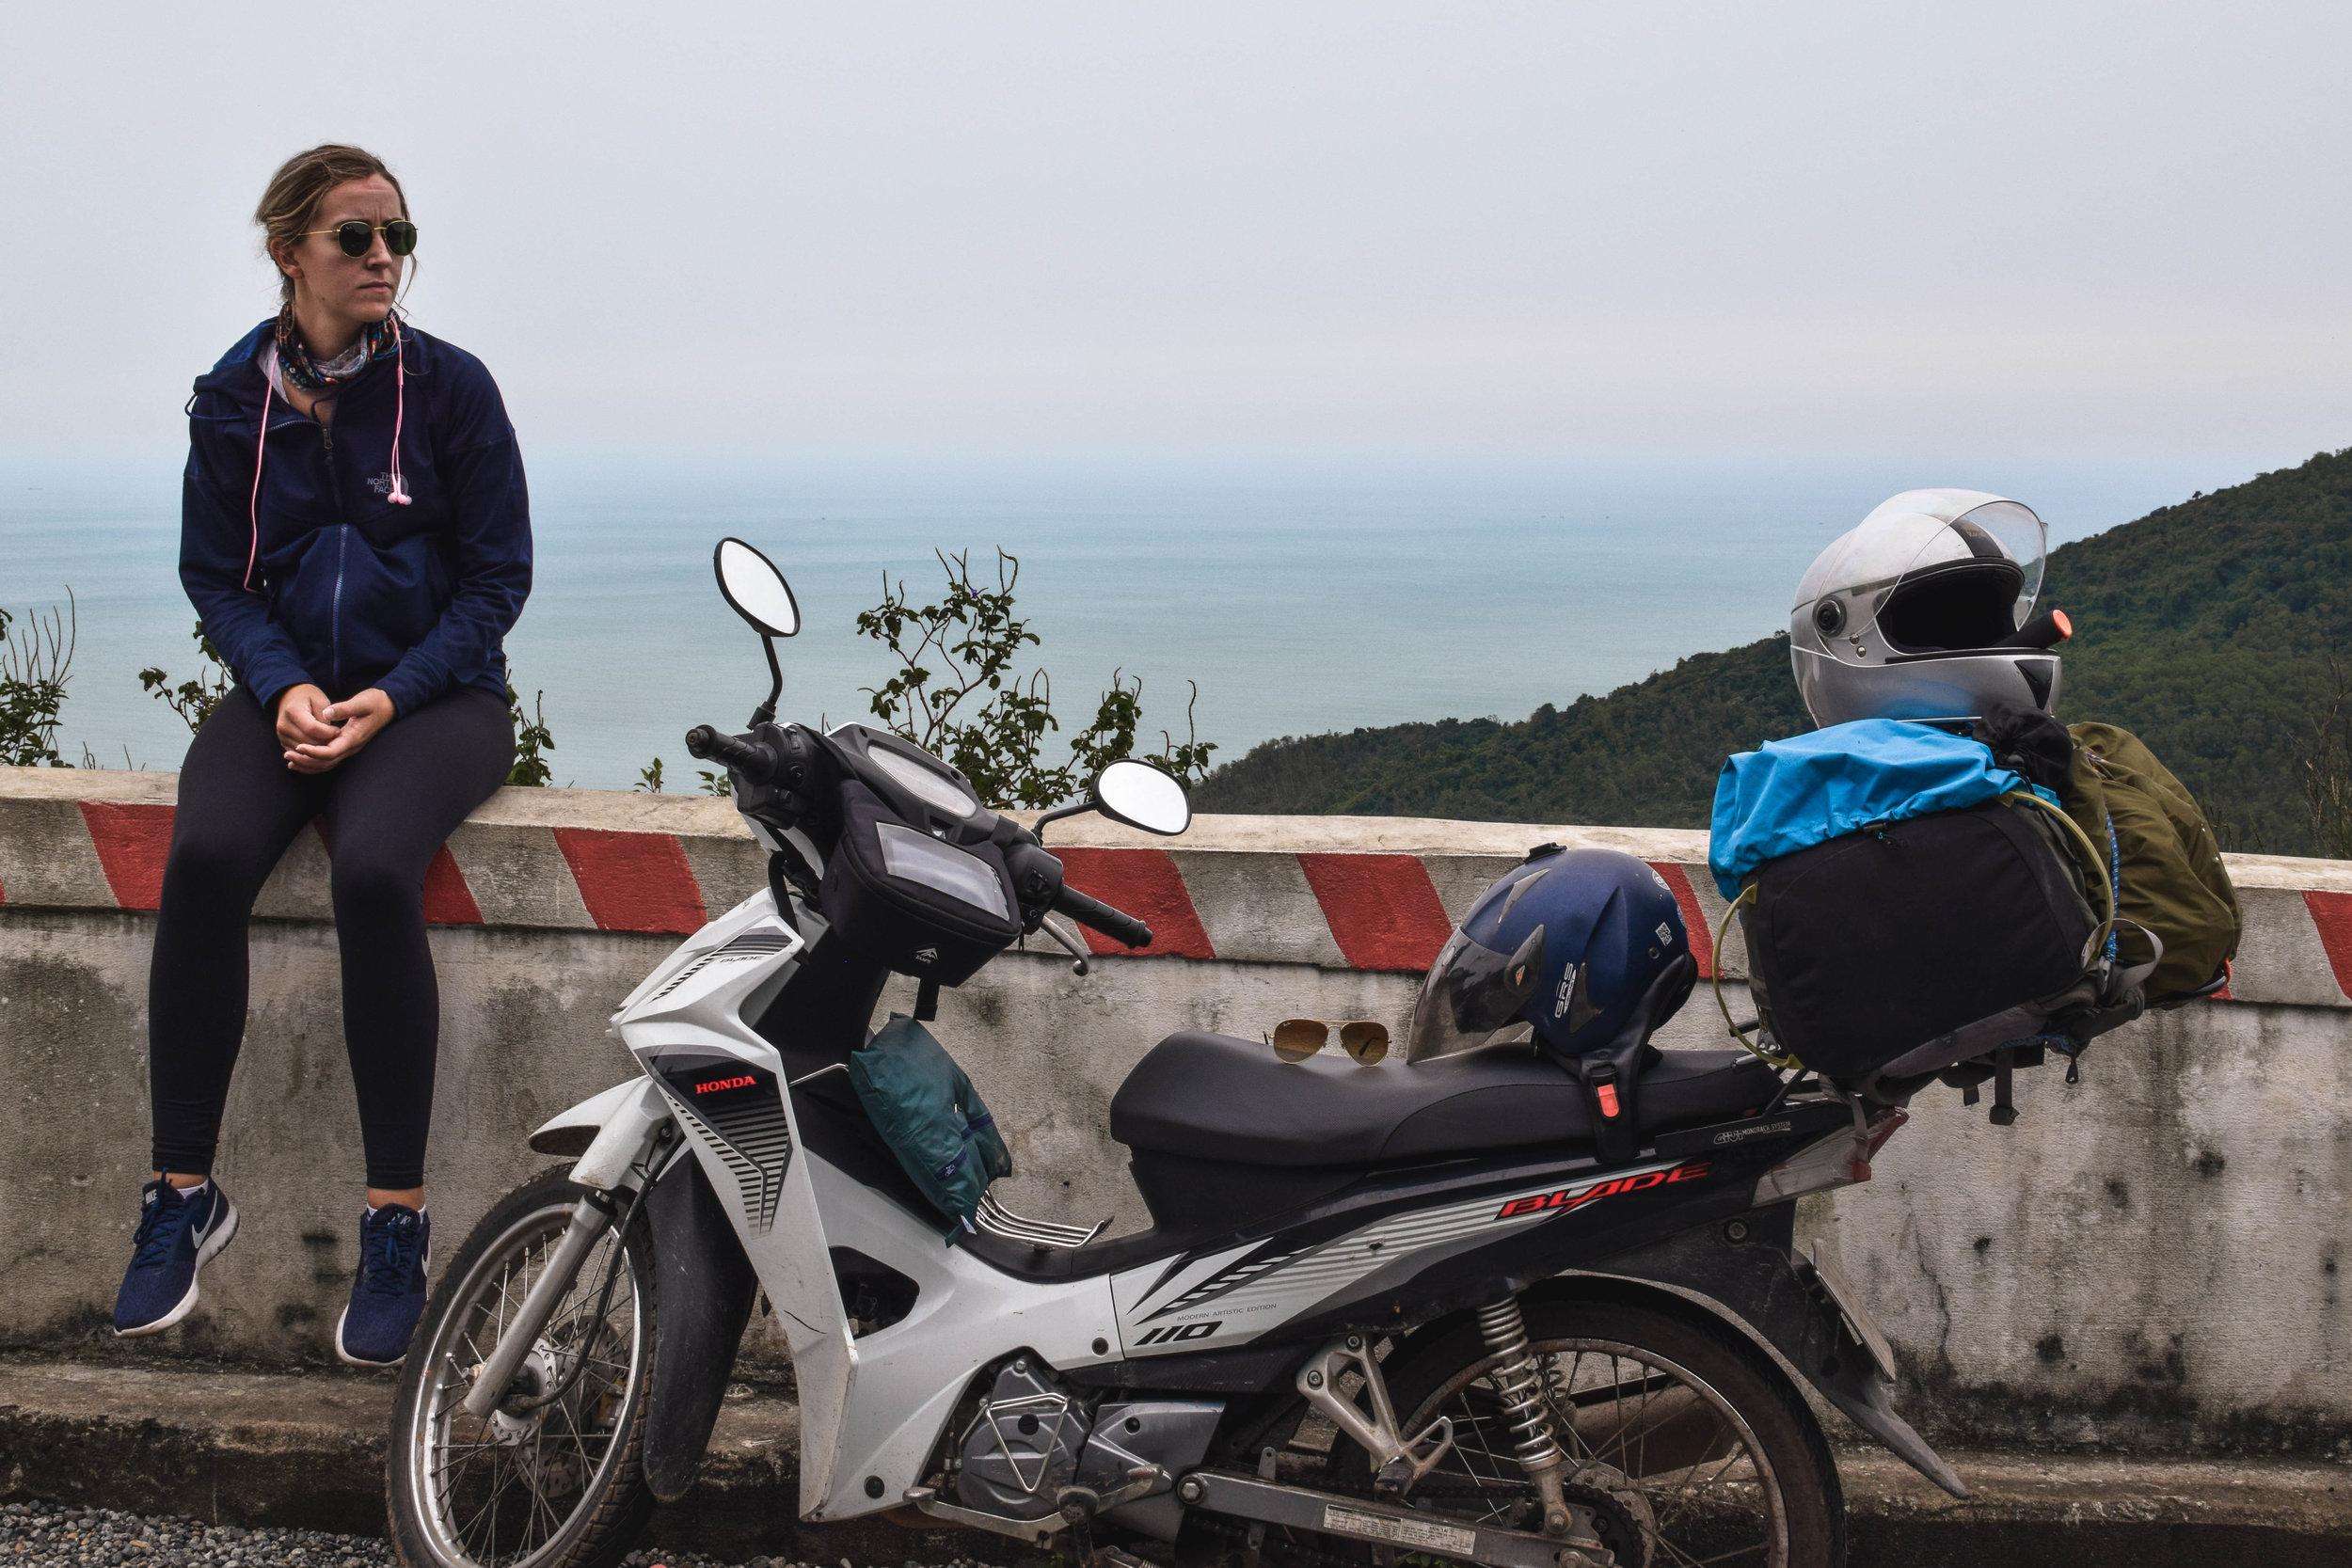 Taking a butt break atop the Hai Van Pass.